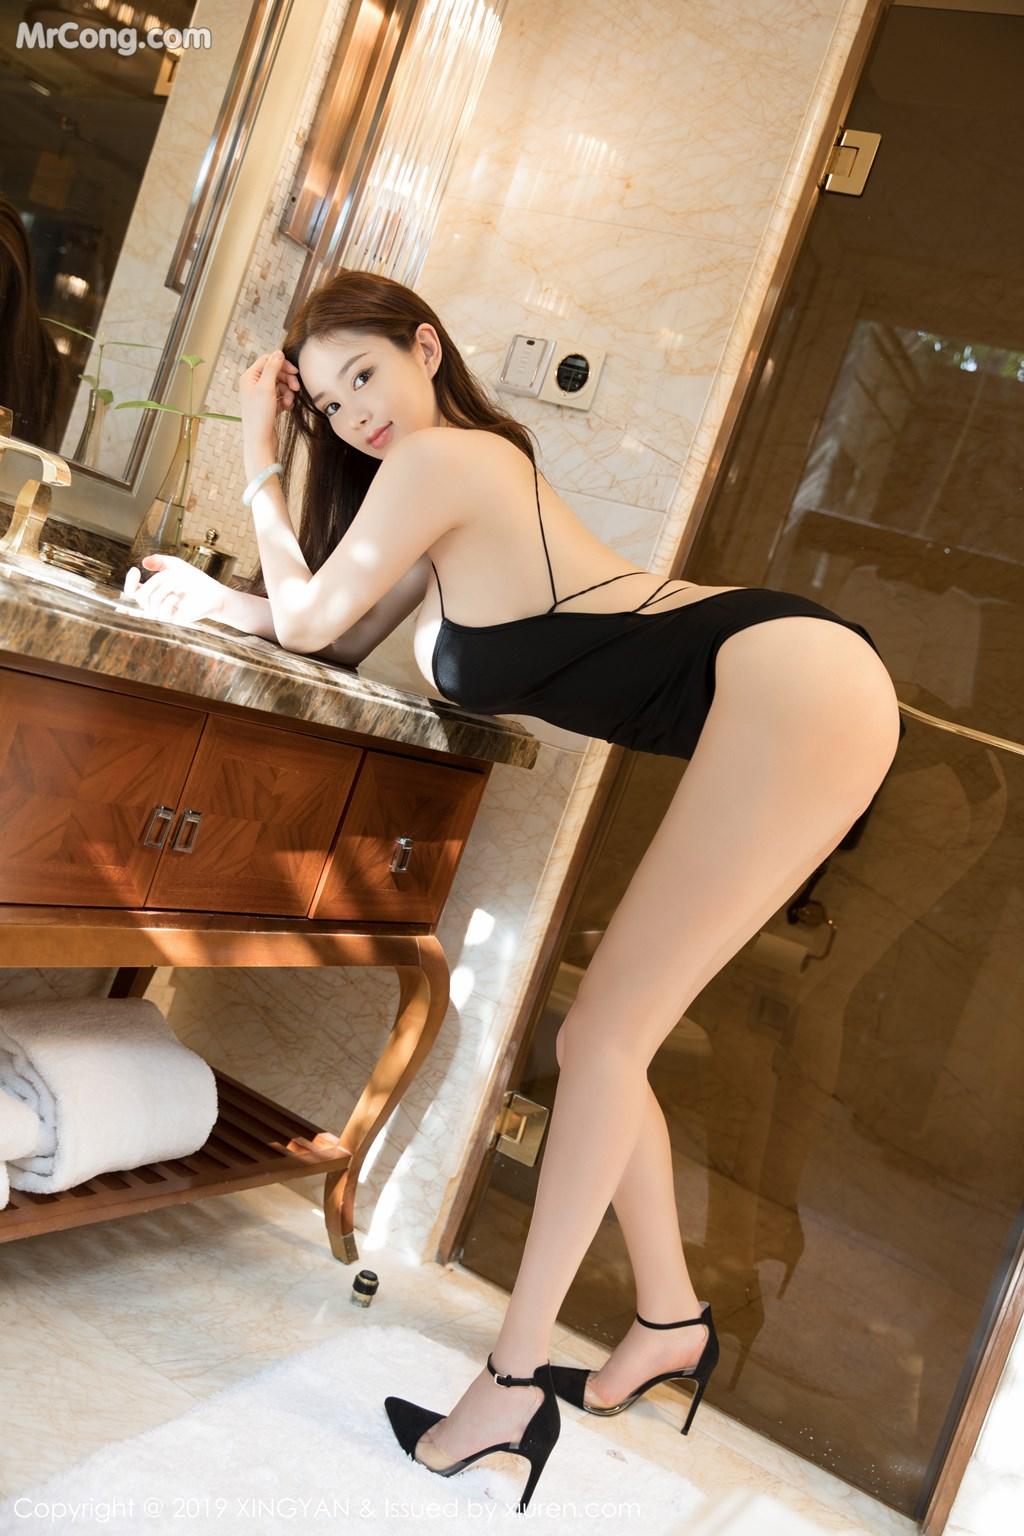 Image XingYan-Vol.124-Silvia-MrCong.com-038 in post XingYan Vol.124: 易阳Silvia (44 ảnh)